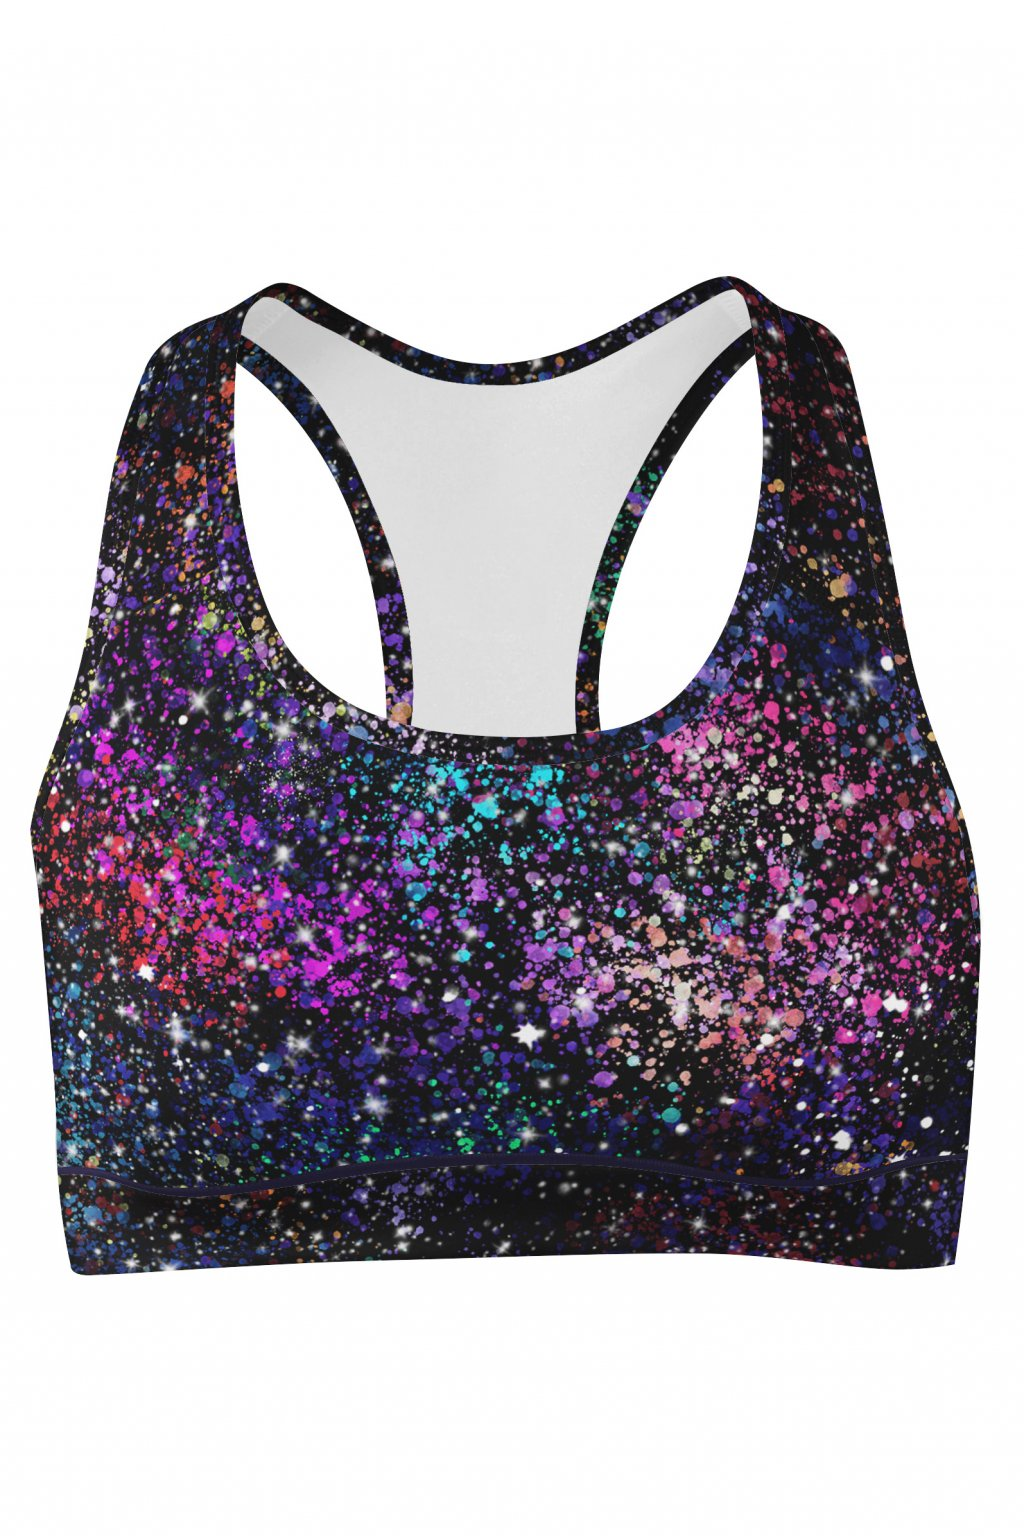 galaxy sport bra front by utopy